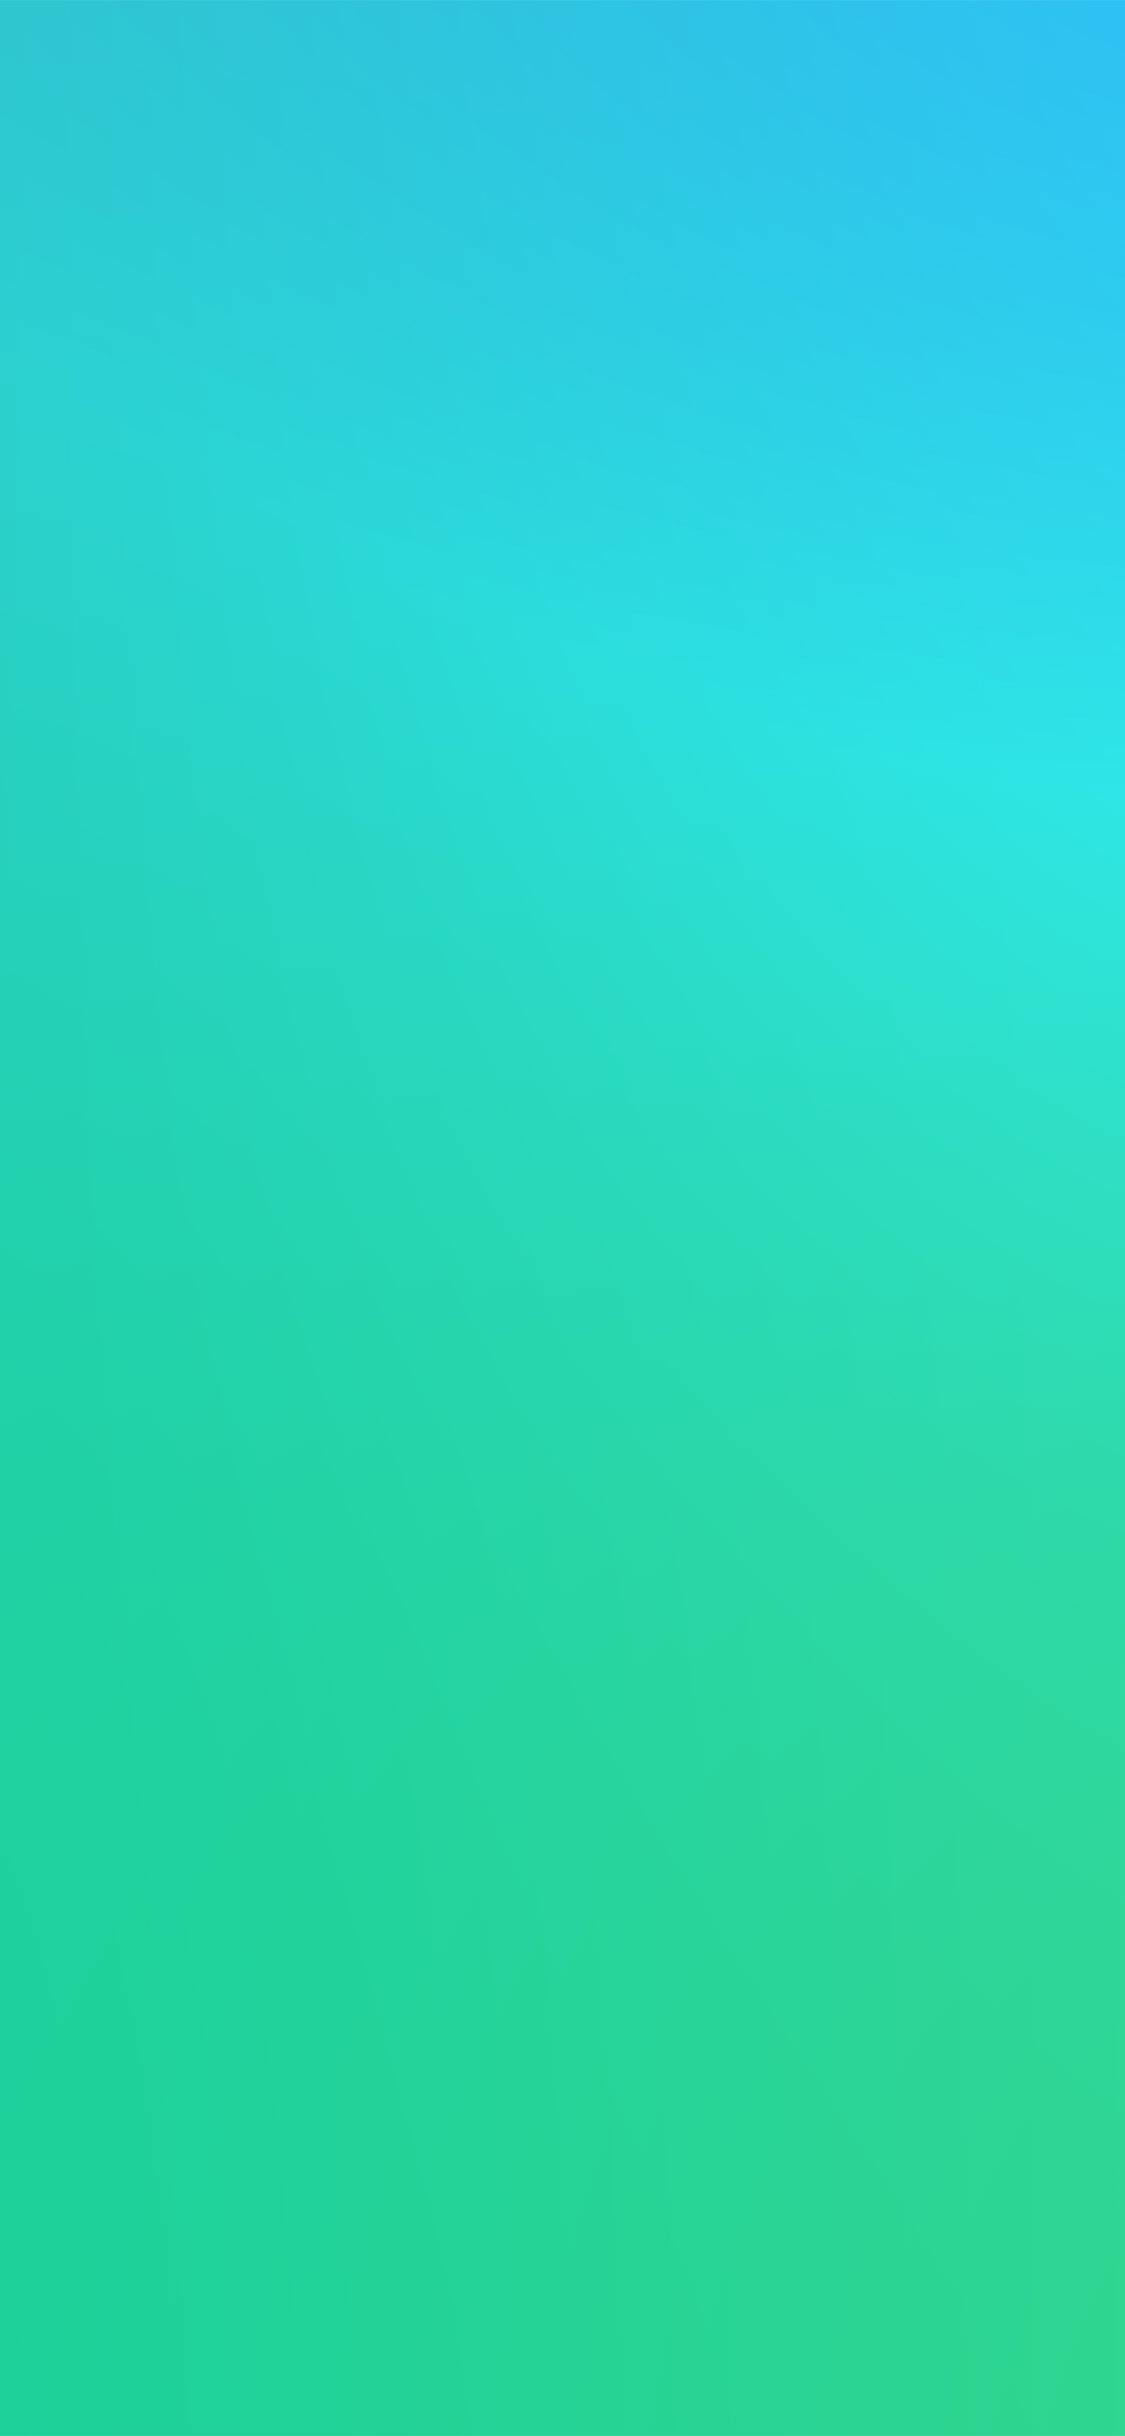 iPhonexpapers.com-Apple-iPhone-wallpaper-sm06-green-blur-gradation